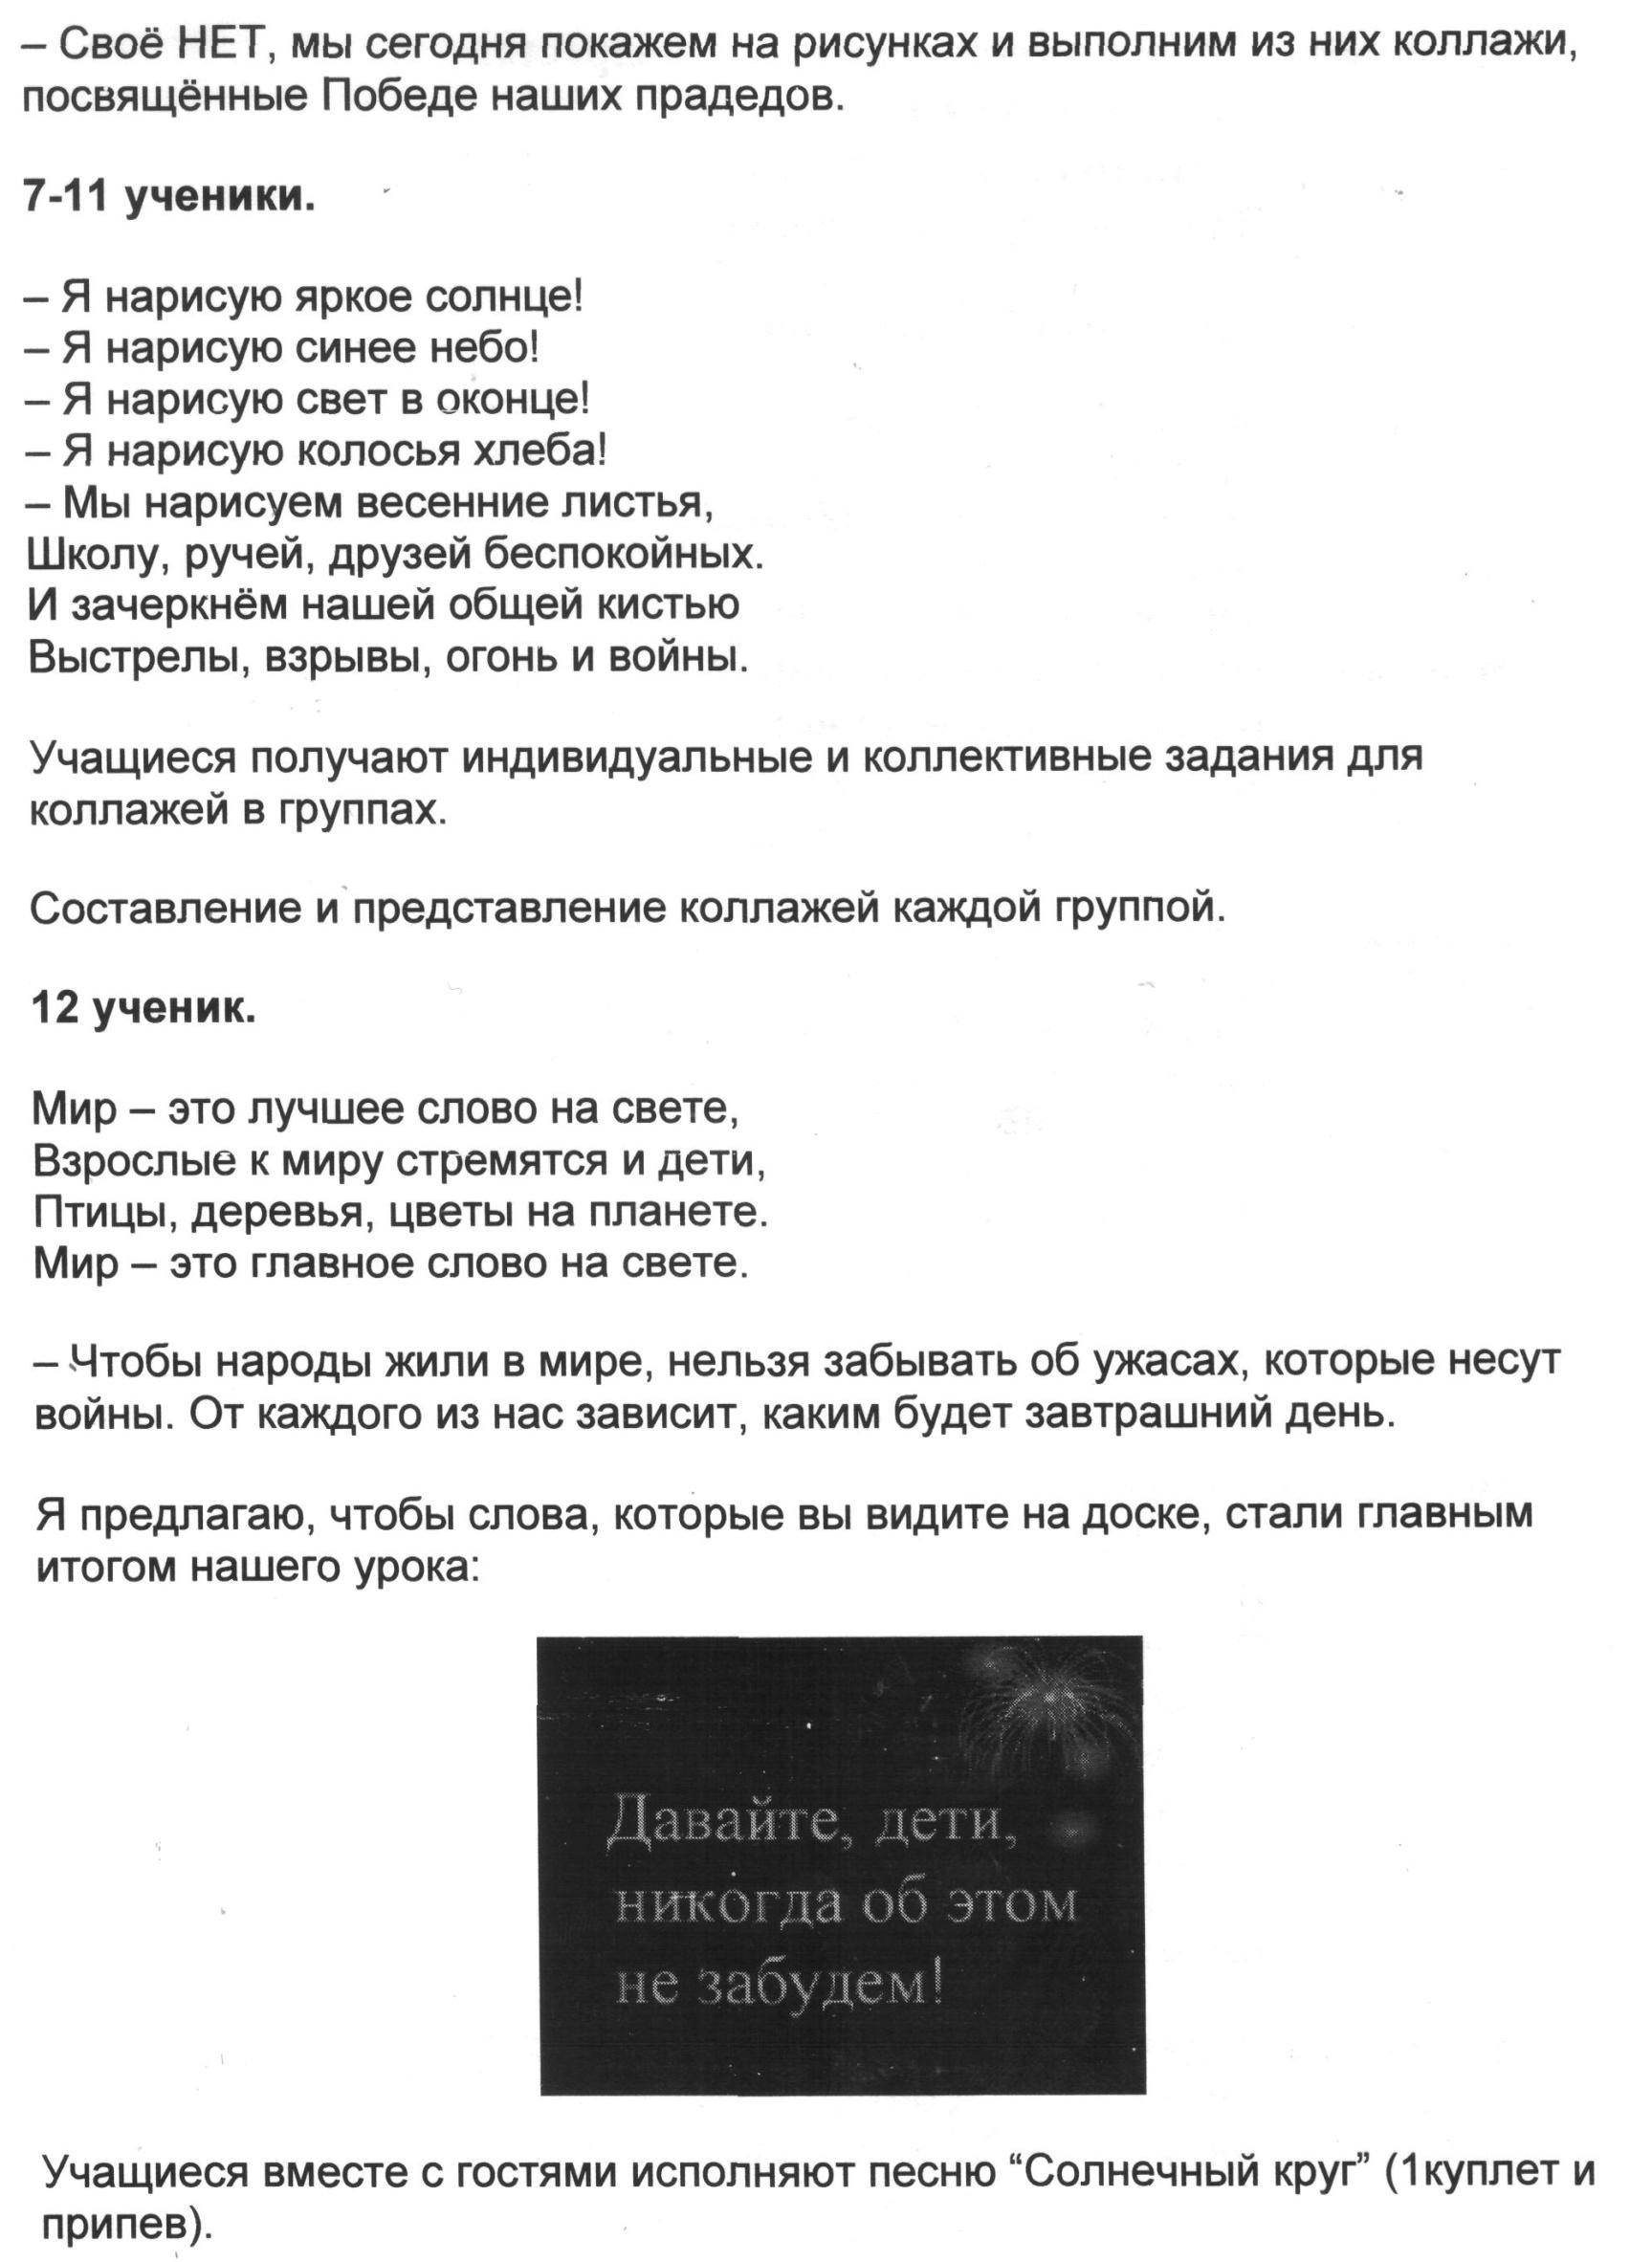 C:\Users\user\Desktop\Умит апай\Новая папка\11.jpg